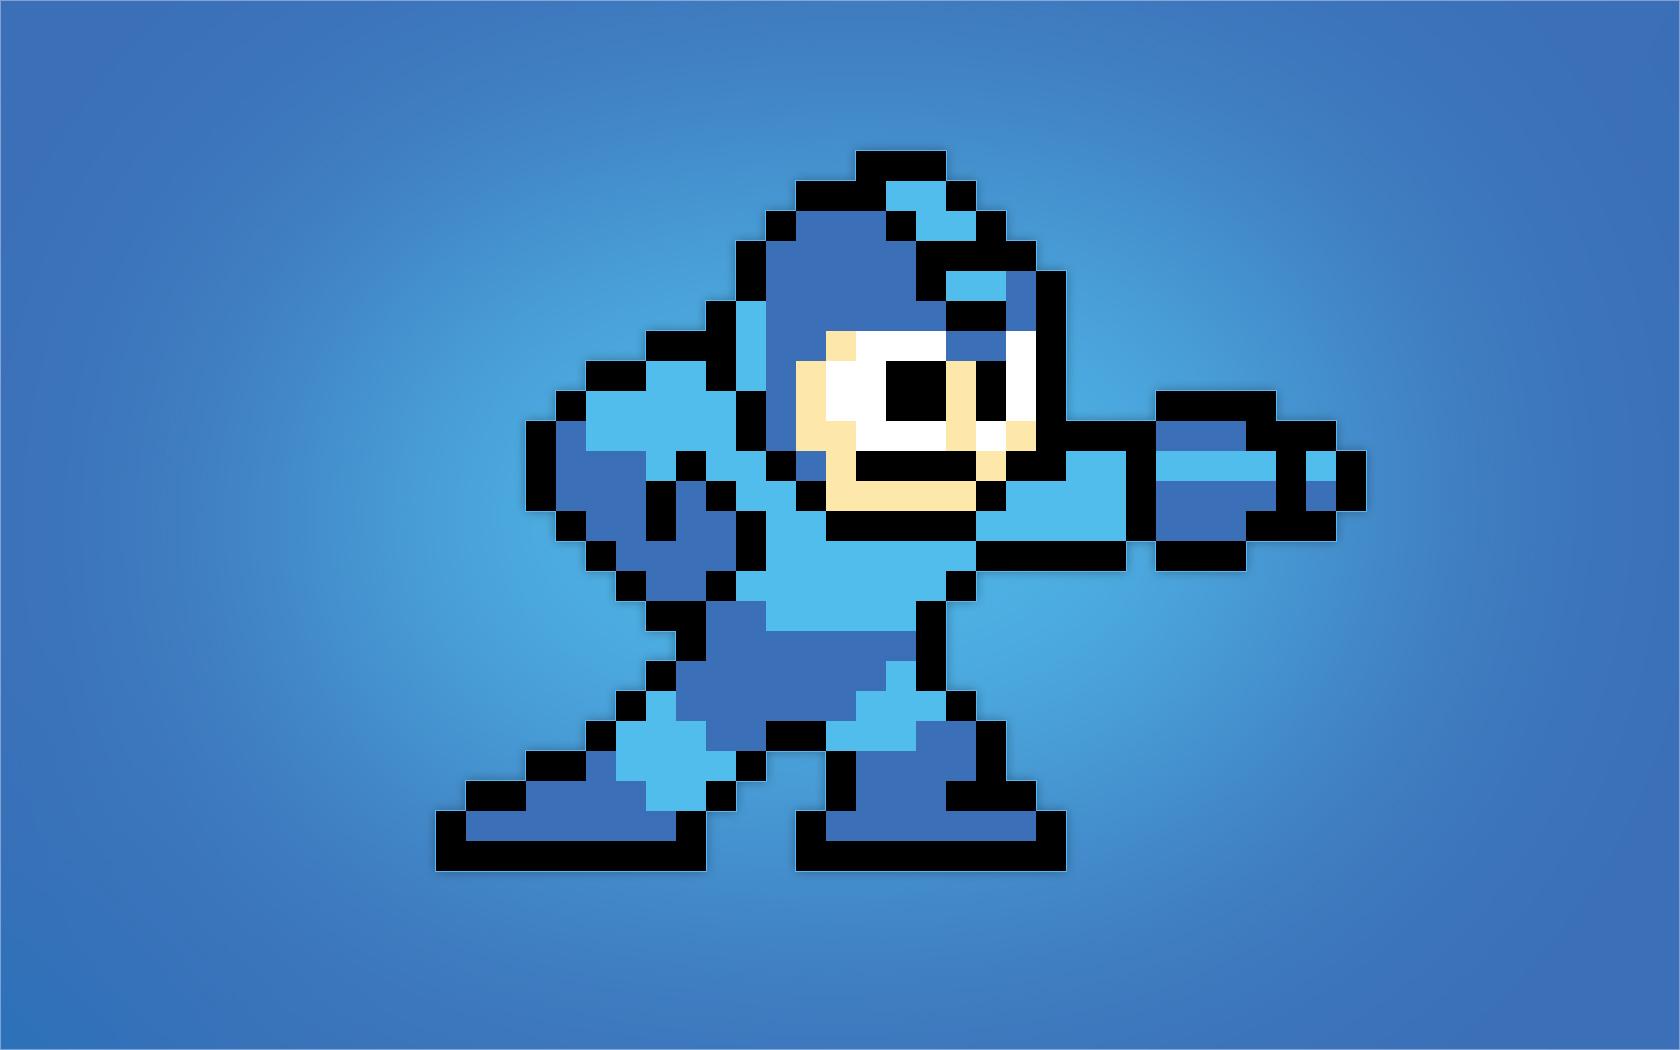 Megaman Pixelado - 1680x1050